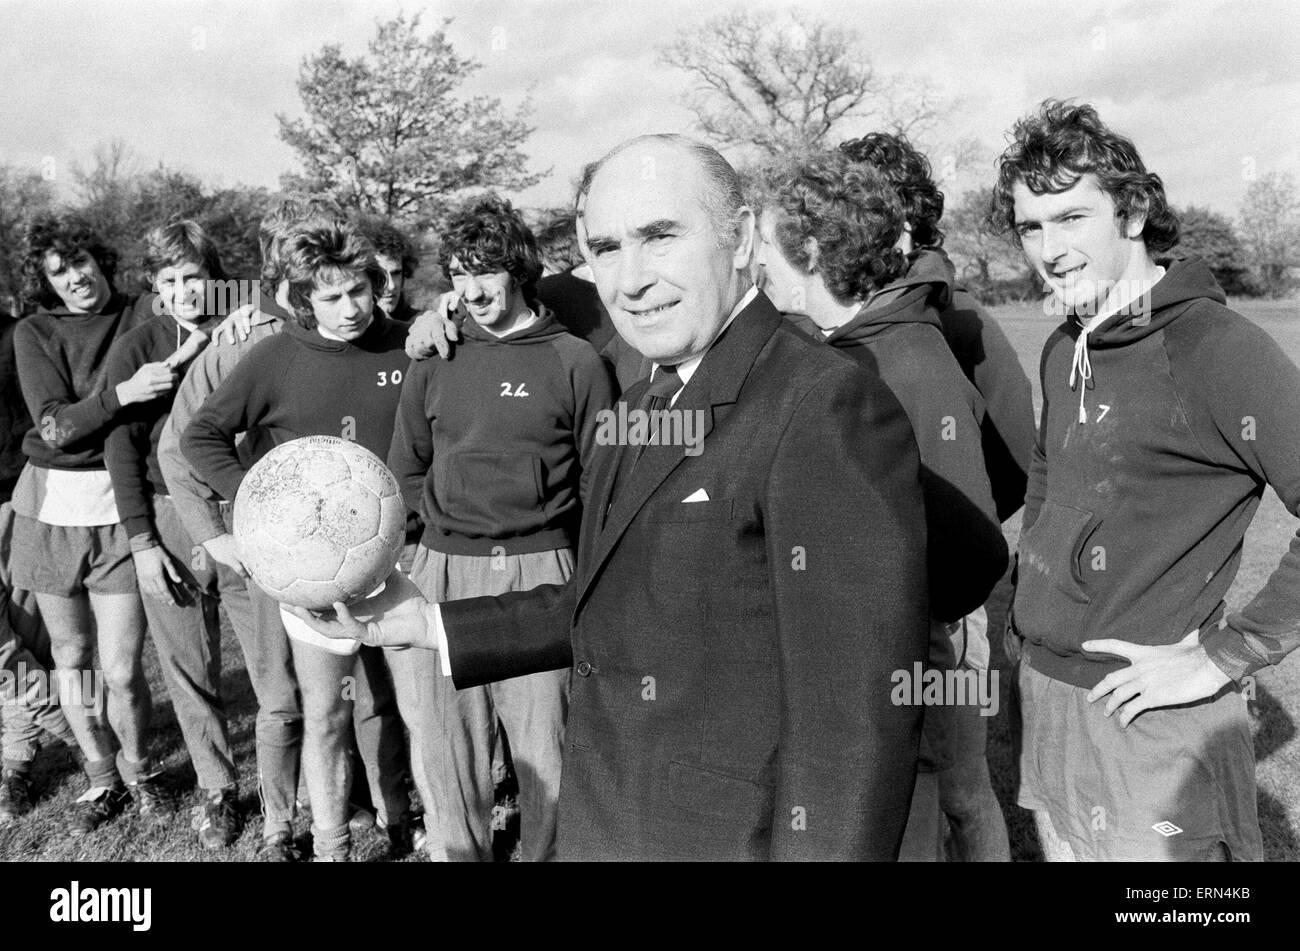 Sir Alf Ramsey taking over at Birmingham City training ground. 3rd November 1977. - Stock Image